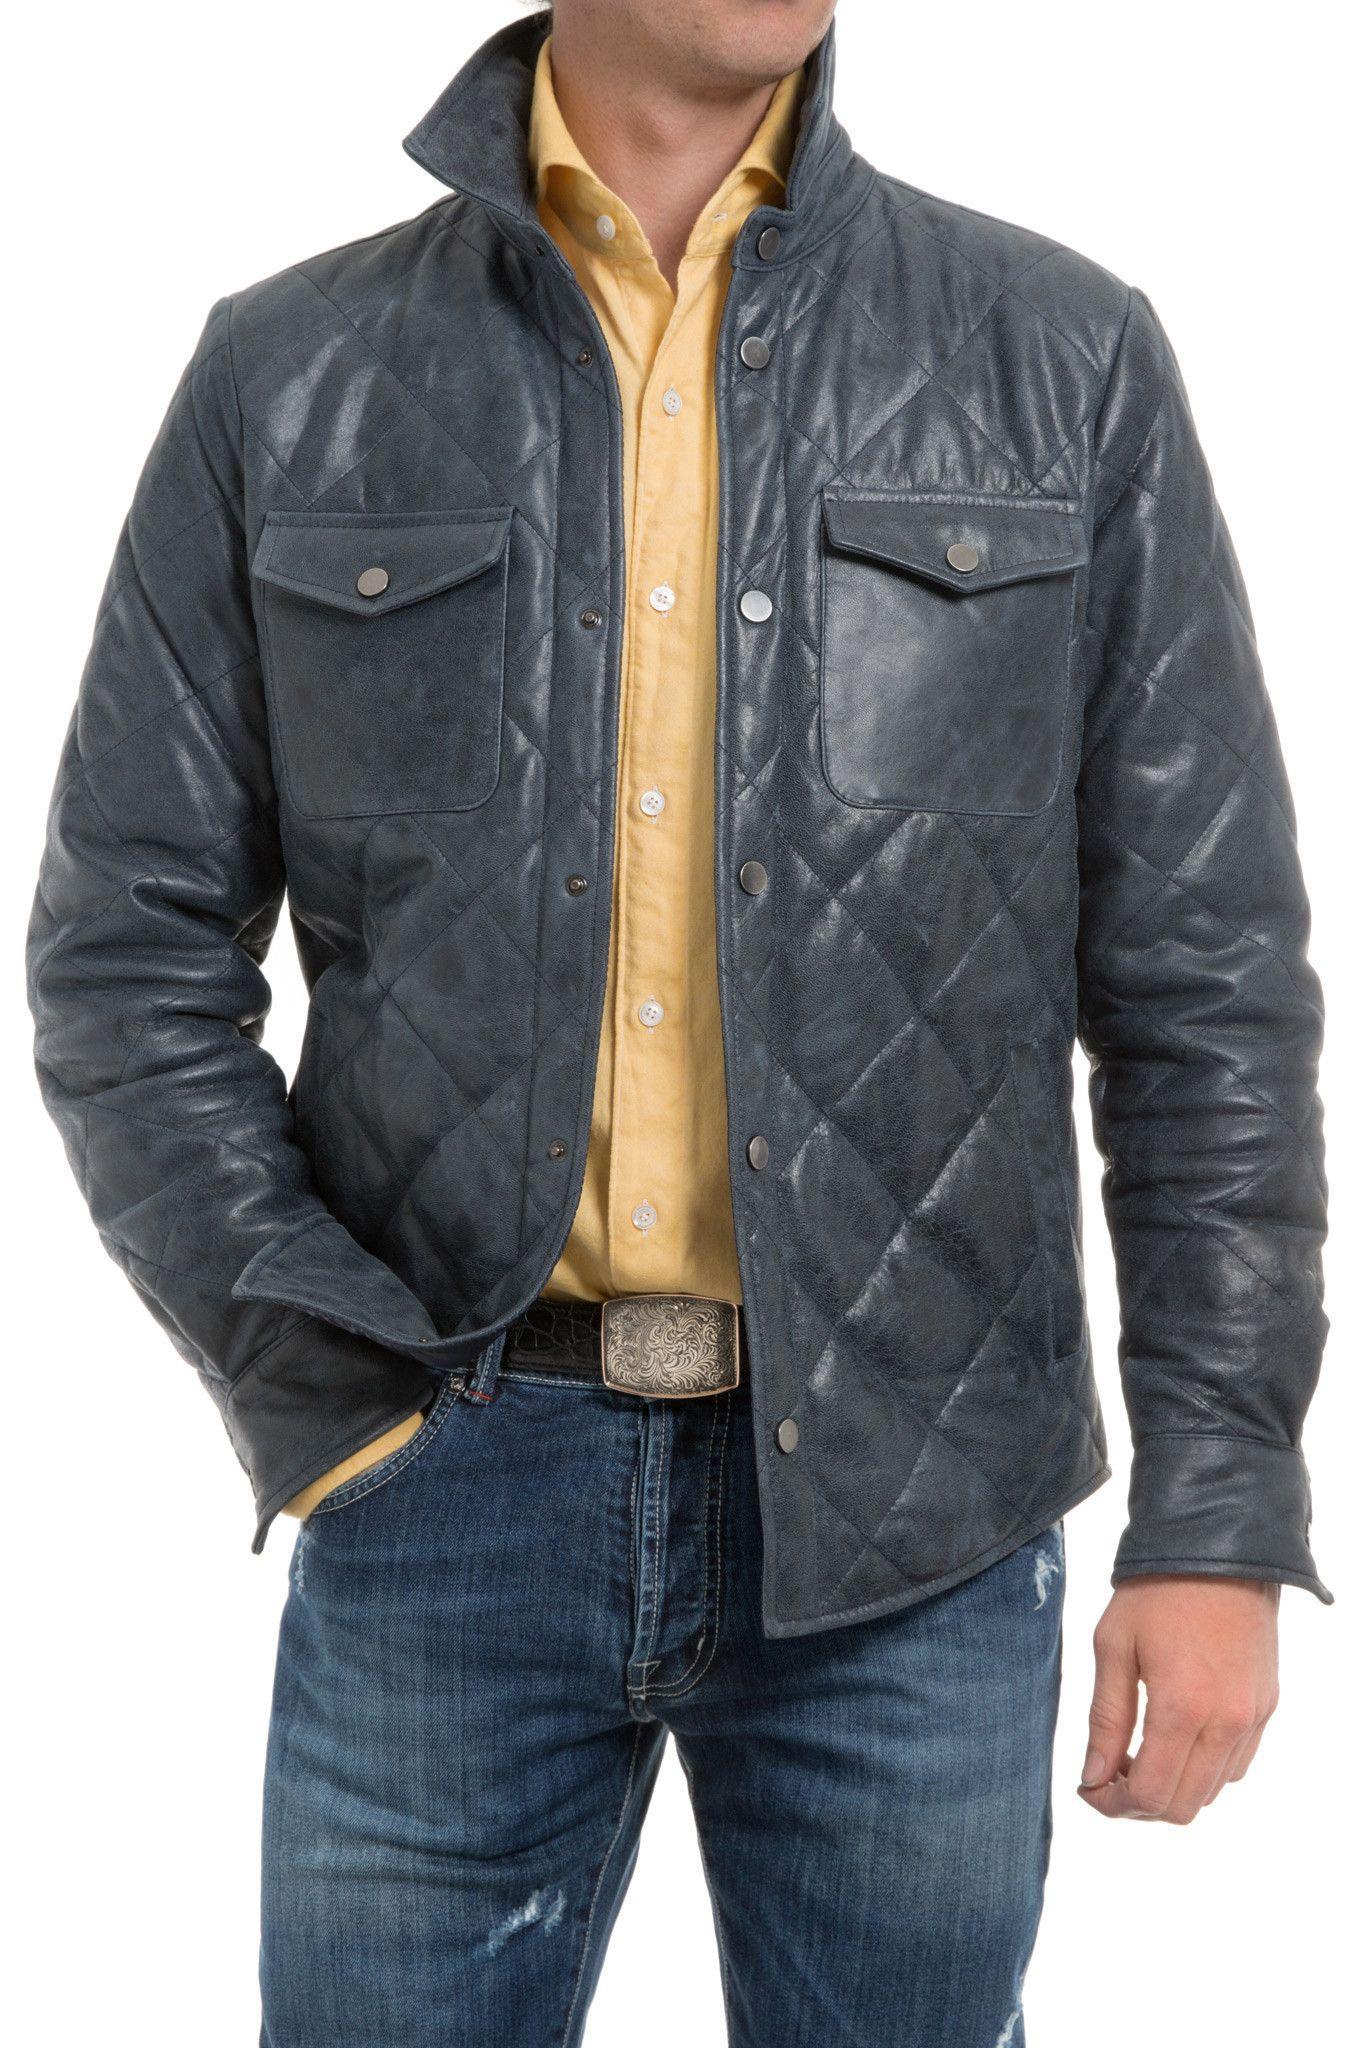 Axel's Academia Jacket (With images) Jackets, Luxury